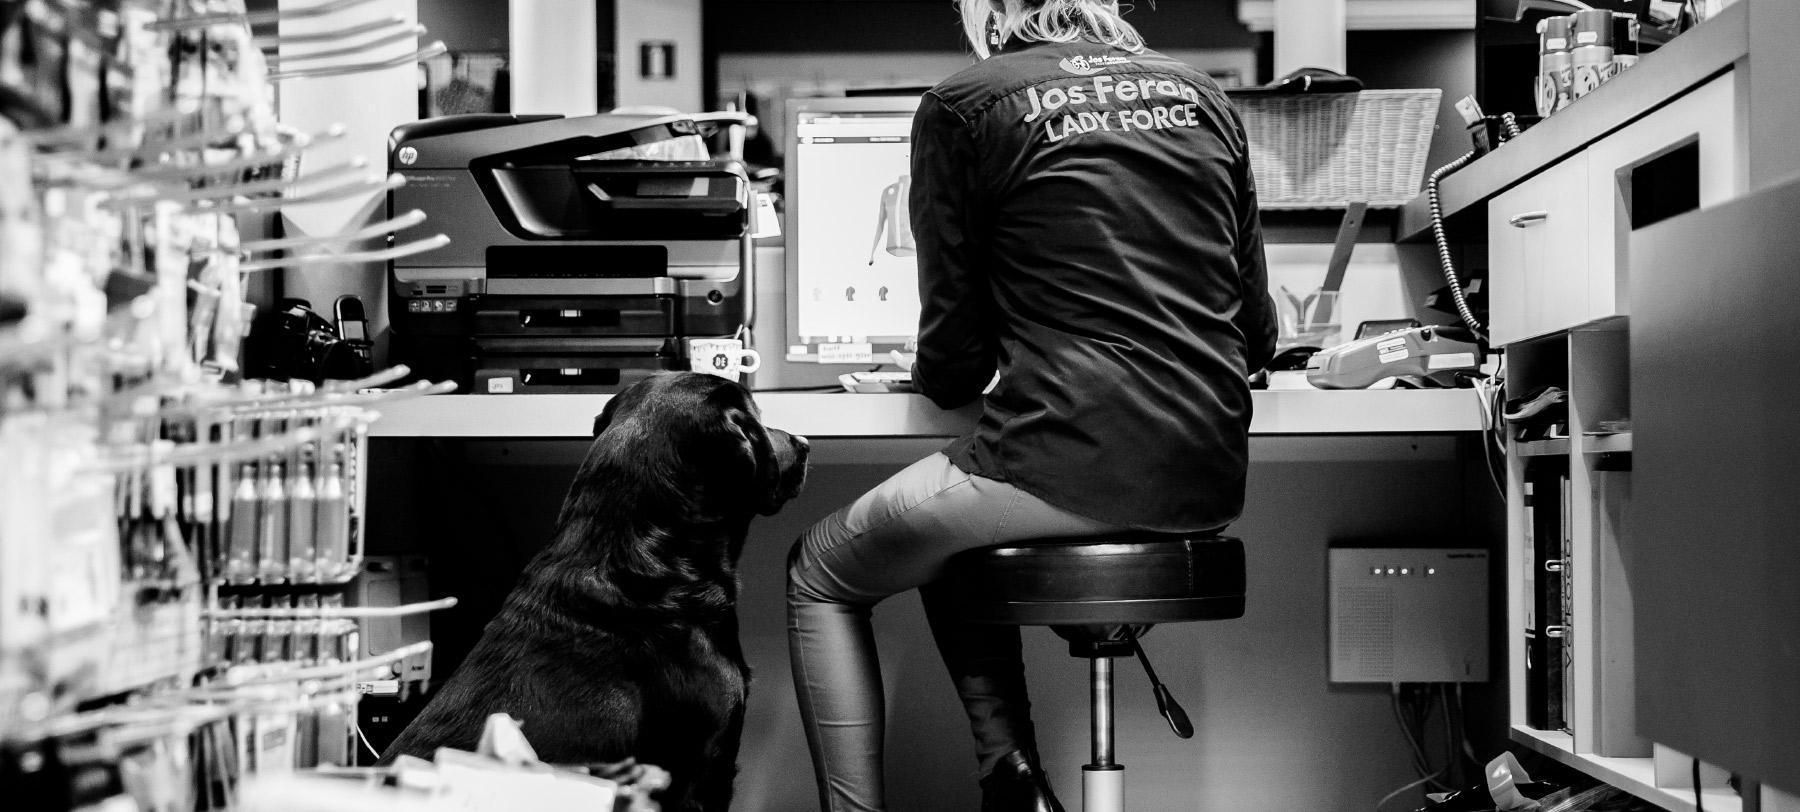 Jos Feron - Ingrid met een hond